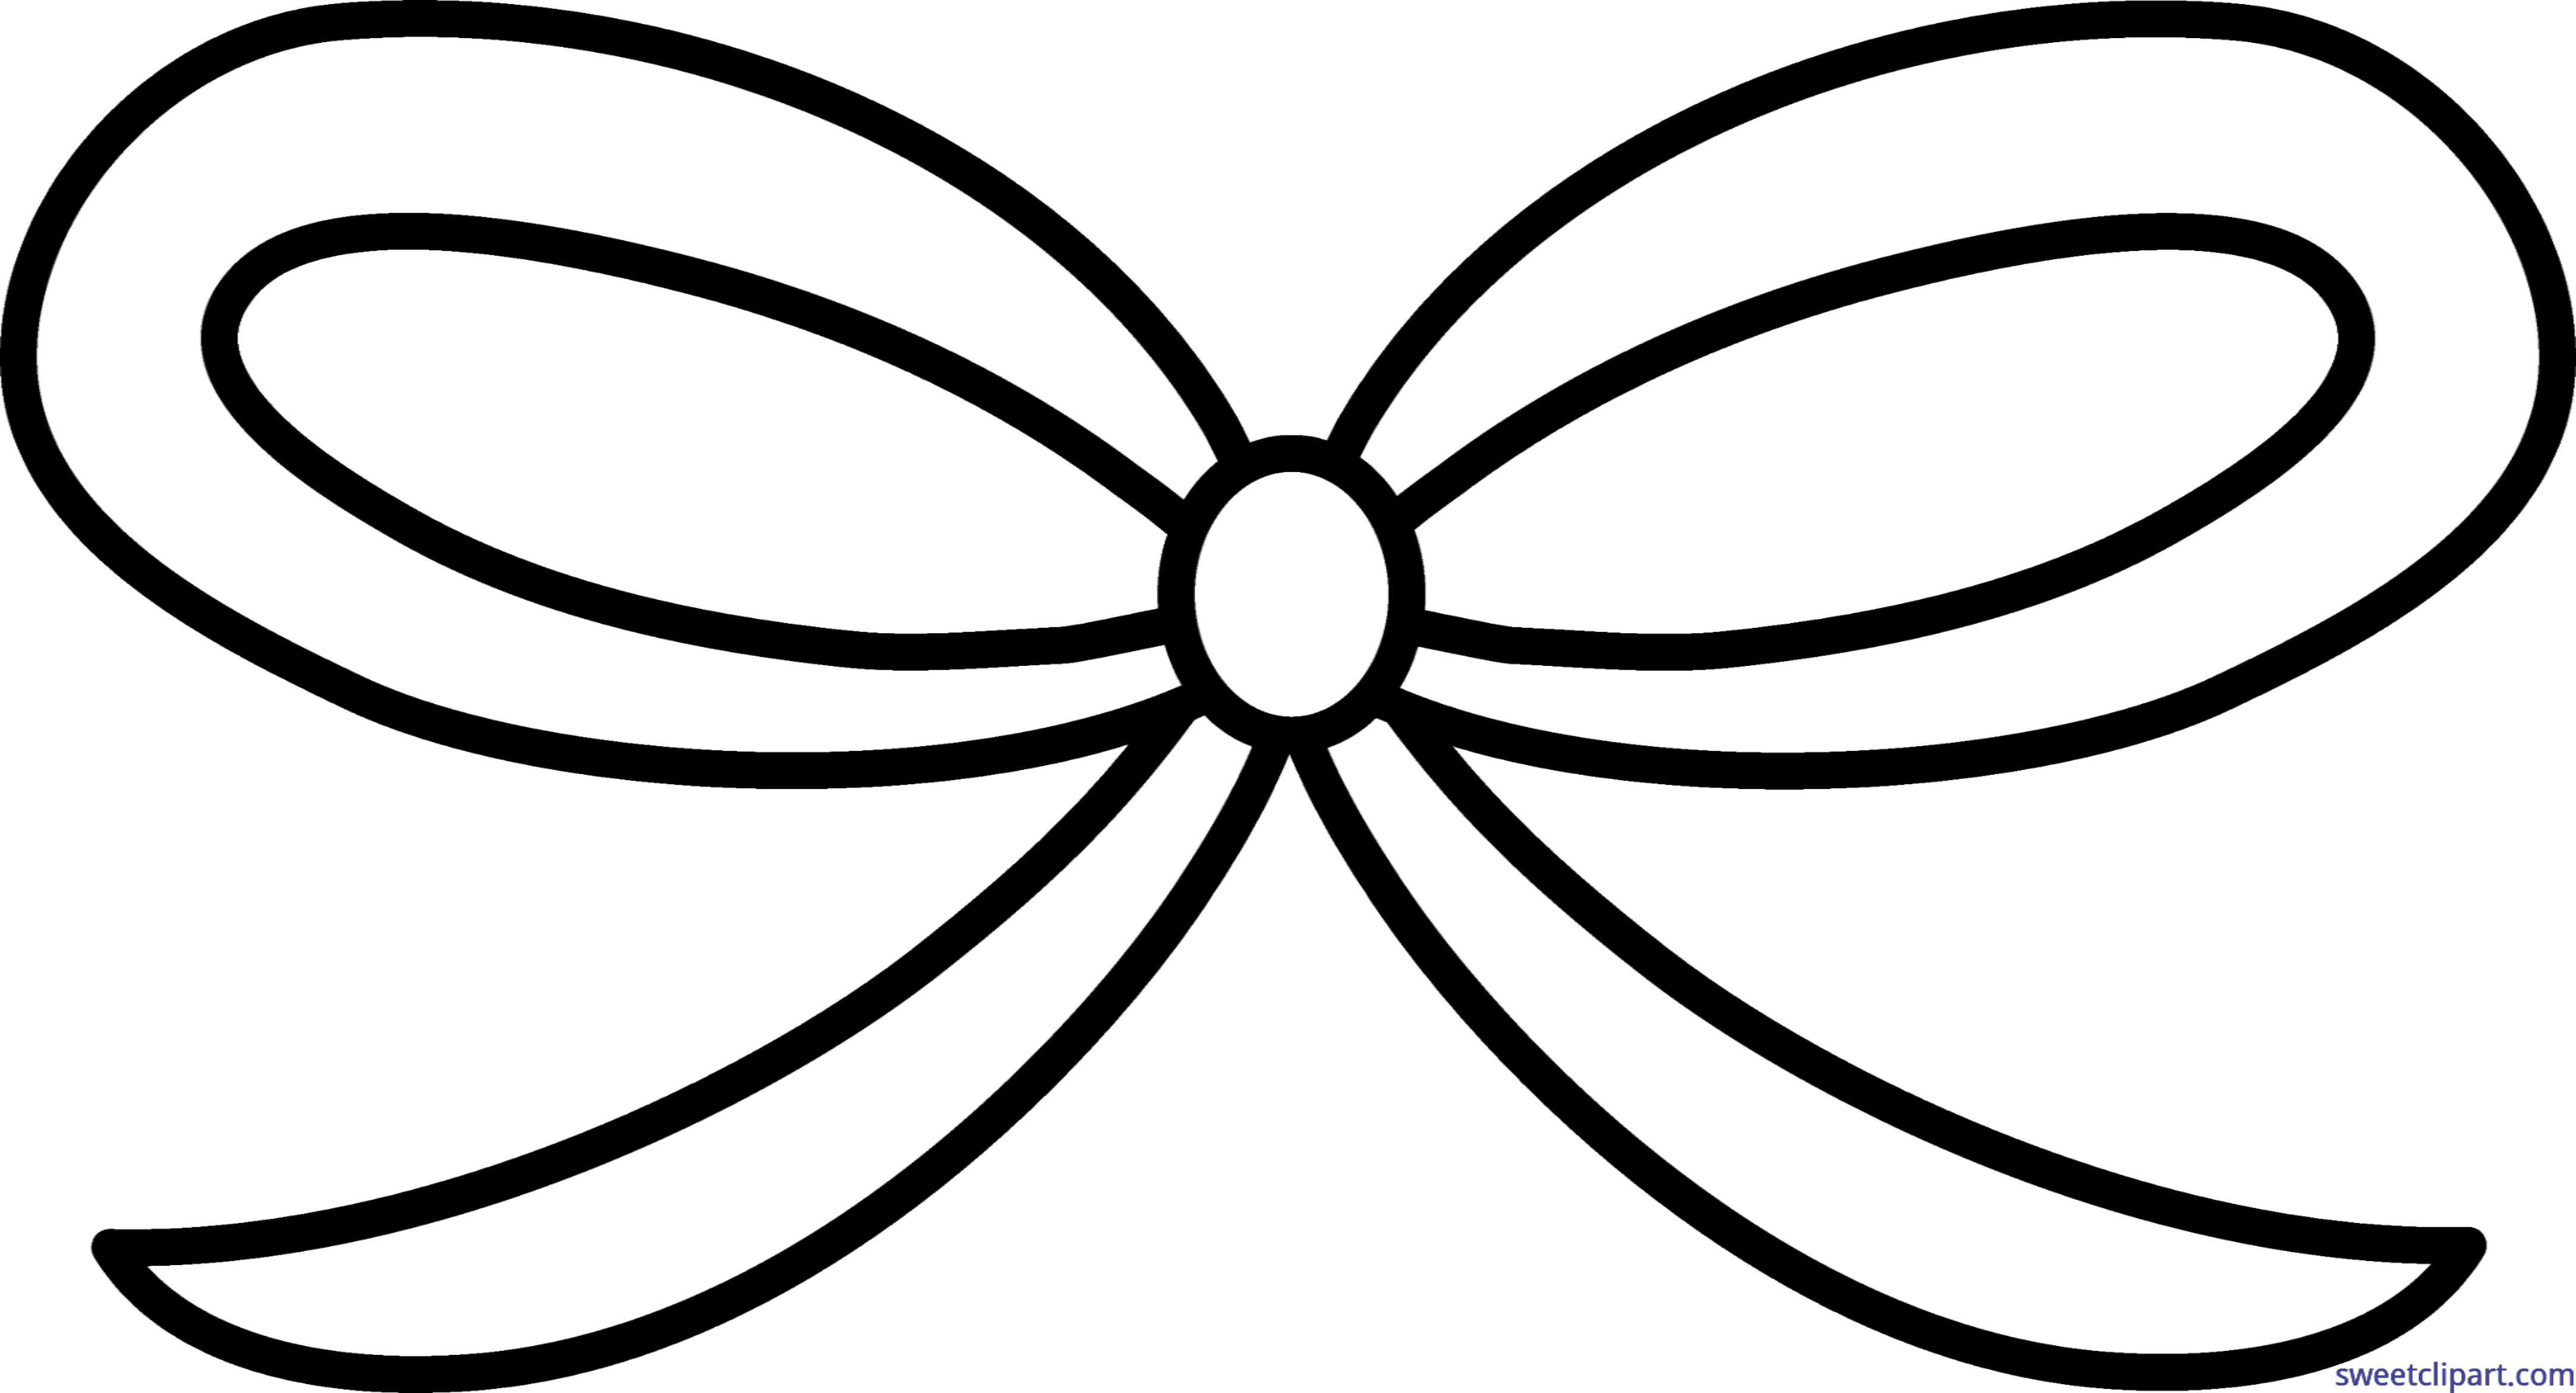 image black and white stock Ribbon